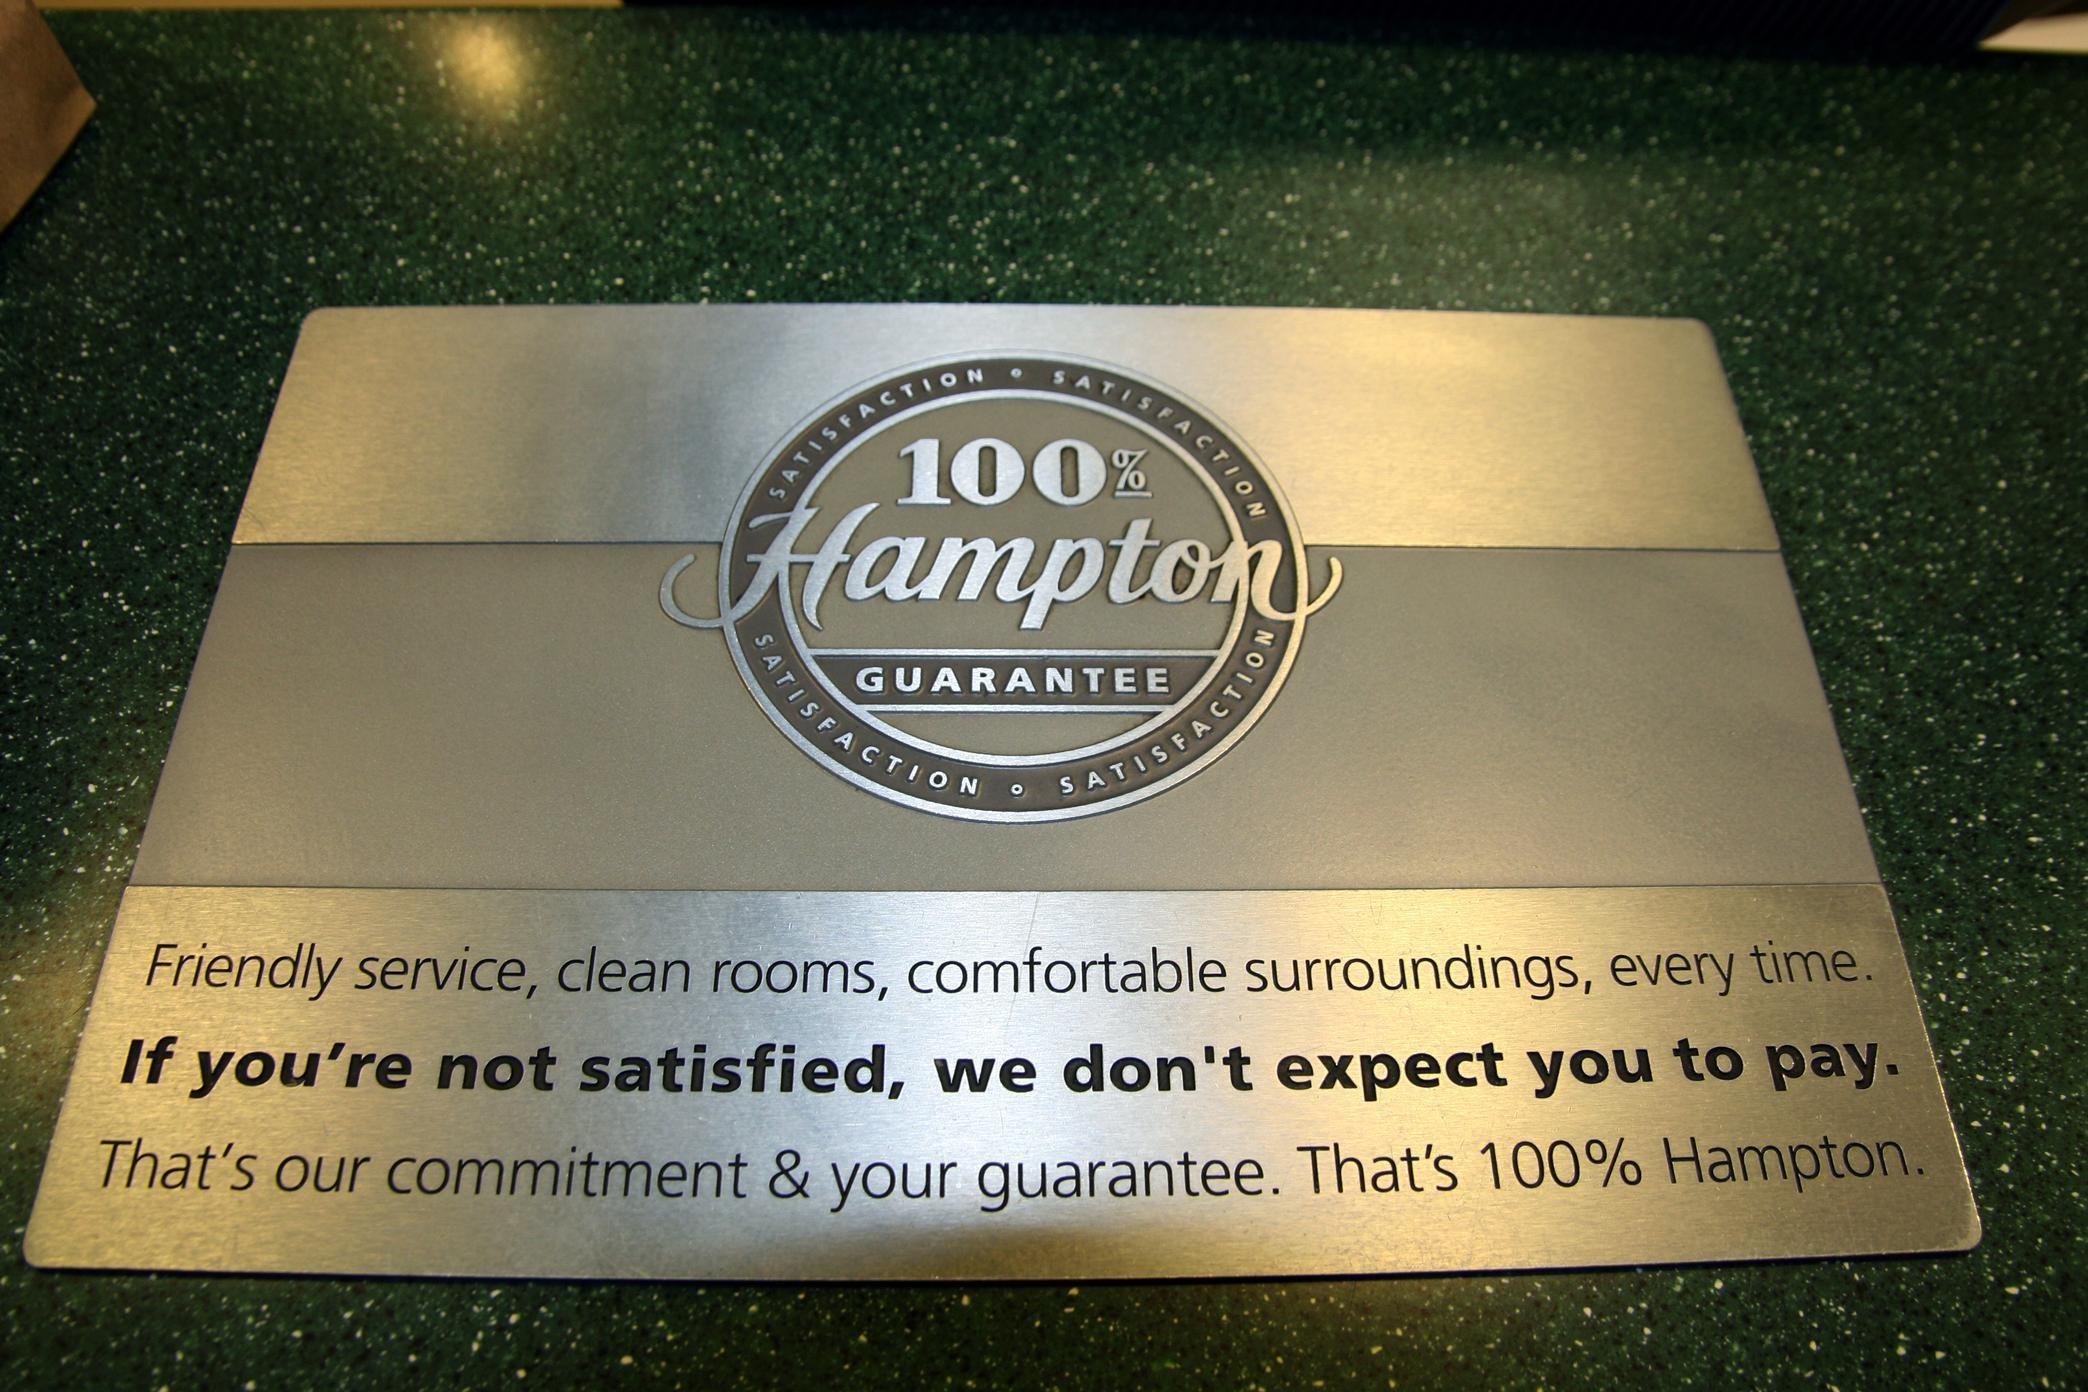 100% Hampton